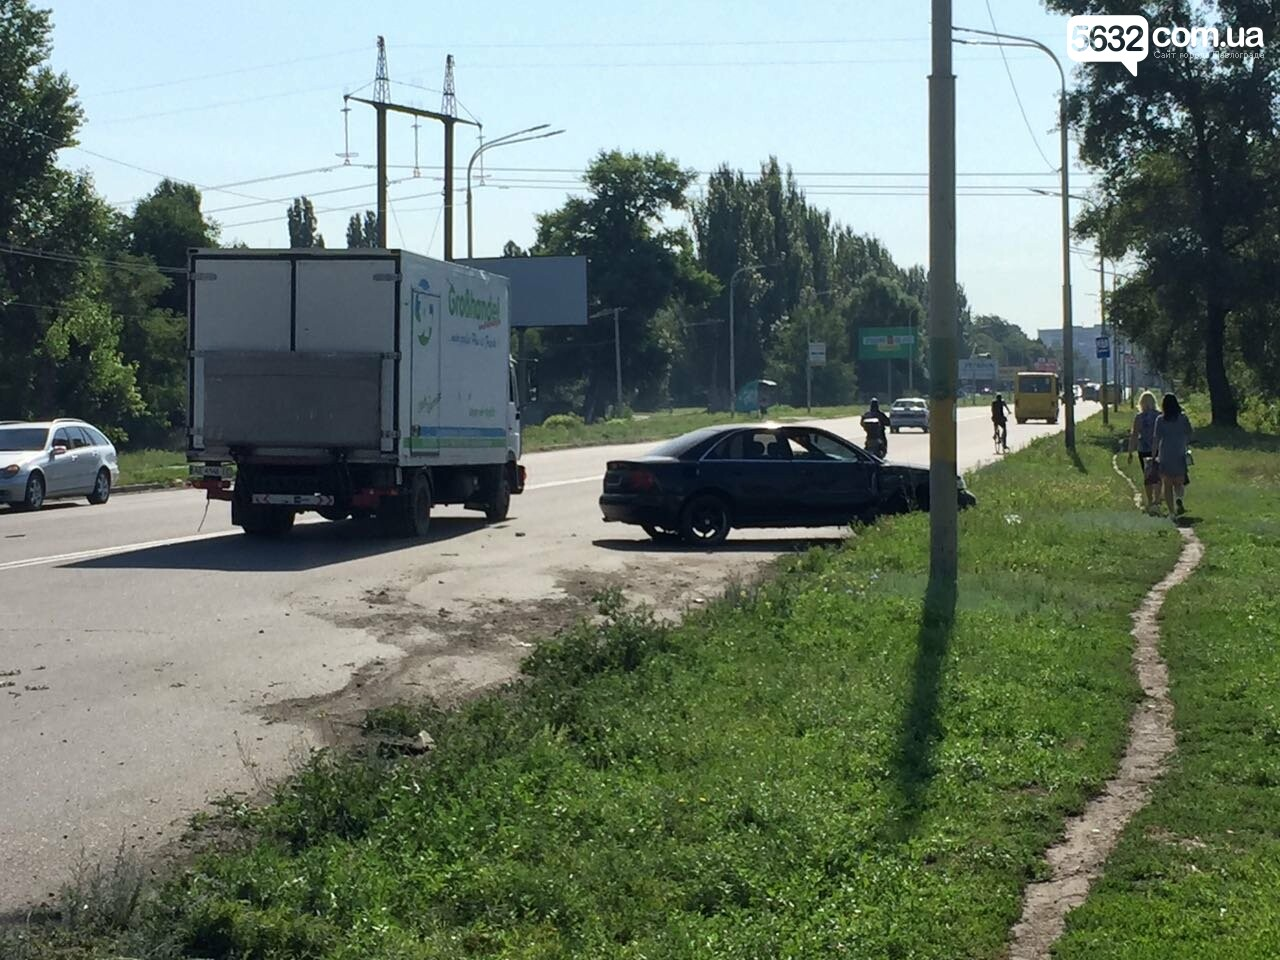 В Павлограде произошло ещё одно ДТП (ФОТО), фото-1